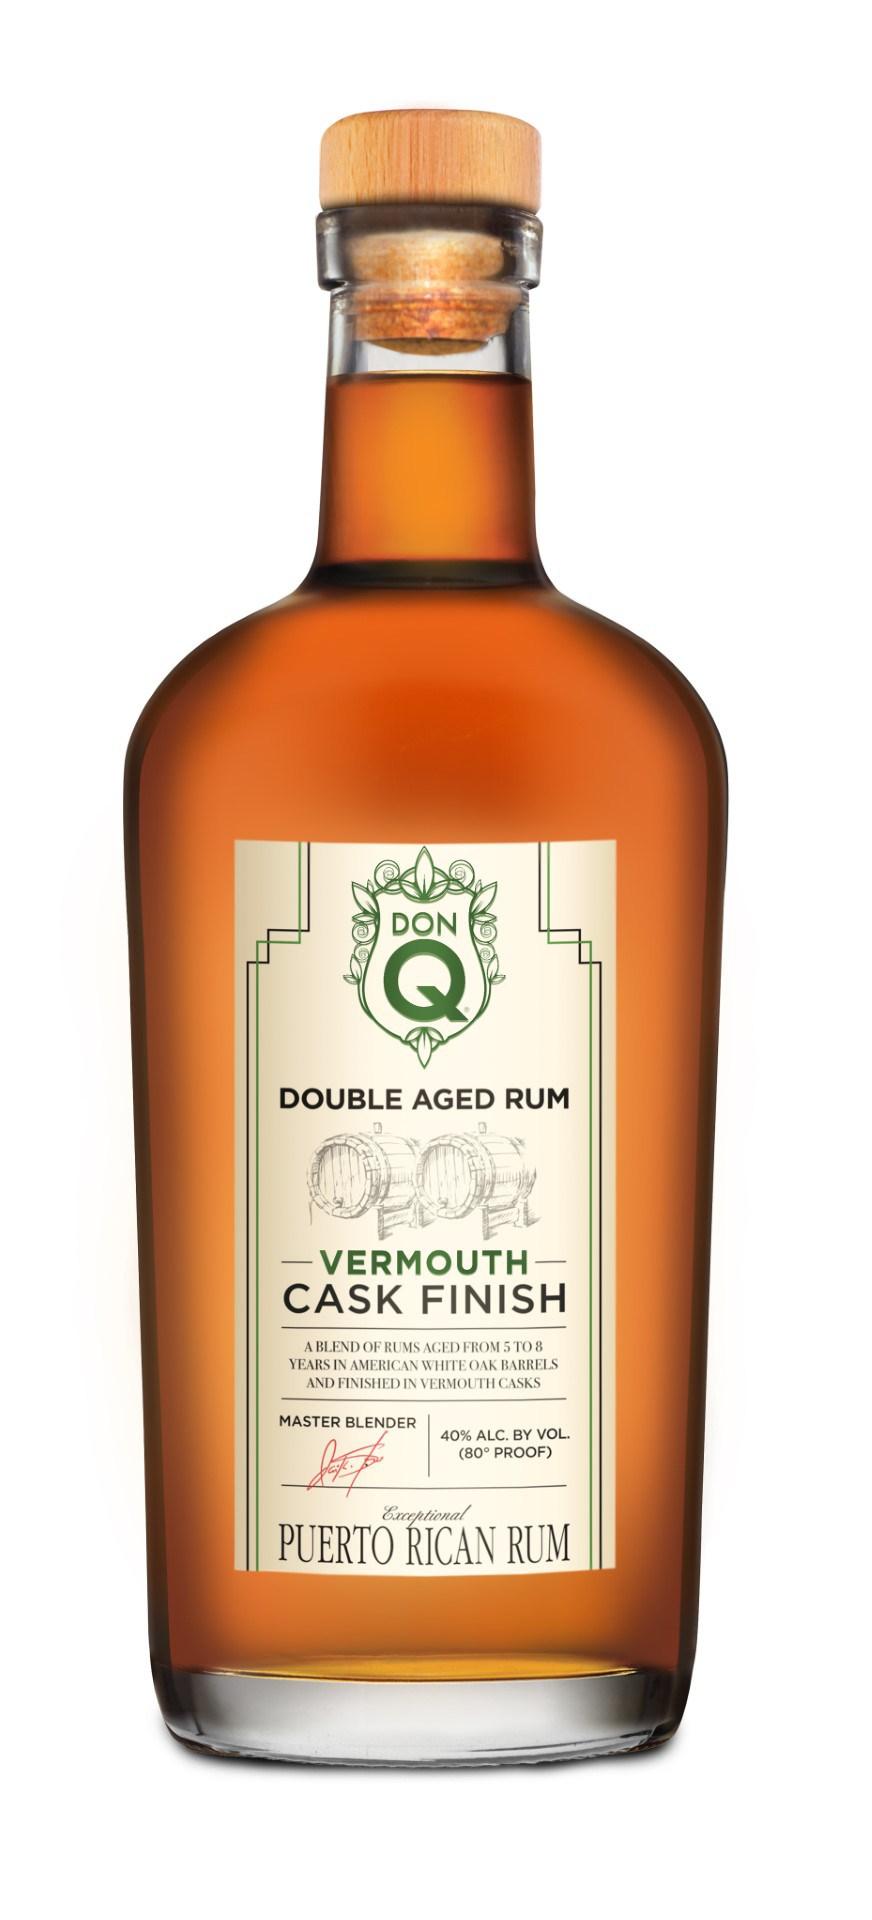 Confezione regalo Double Aged Rum Vermouth Cask Finish DonQ